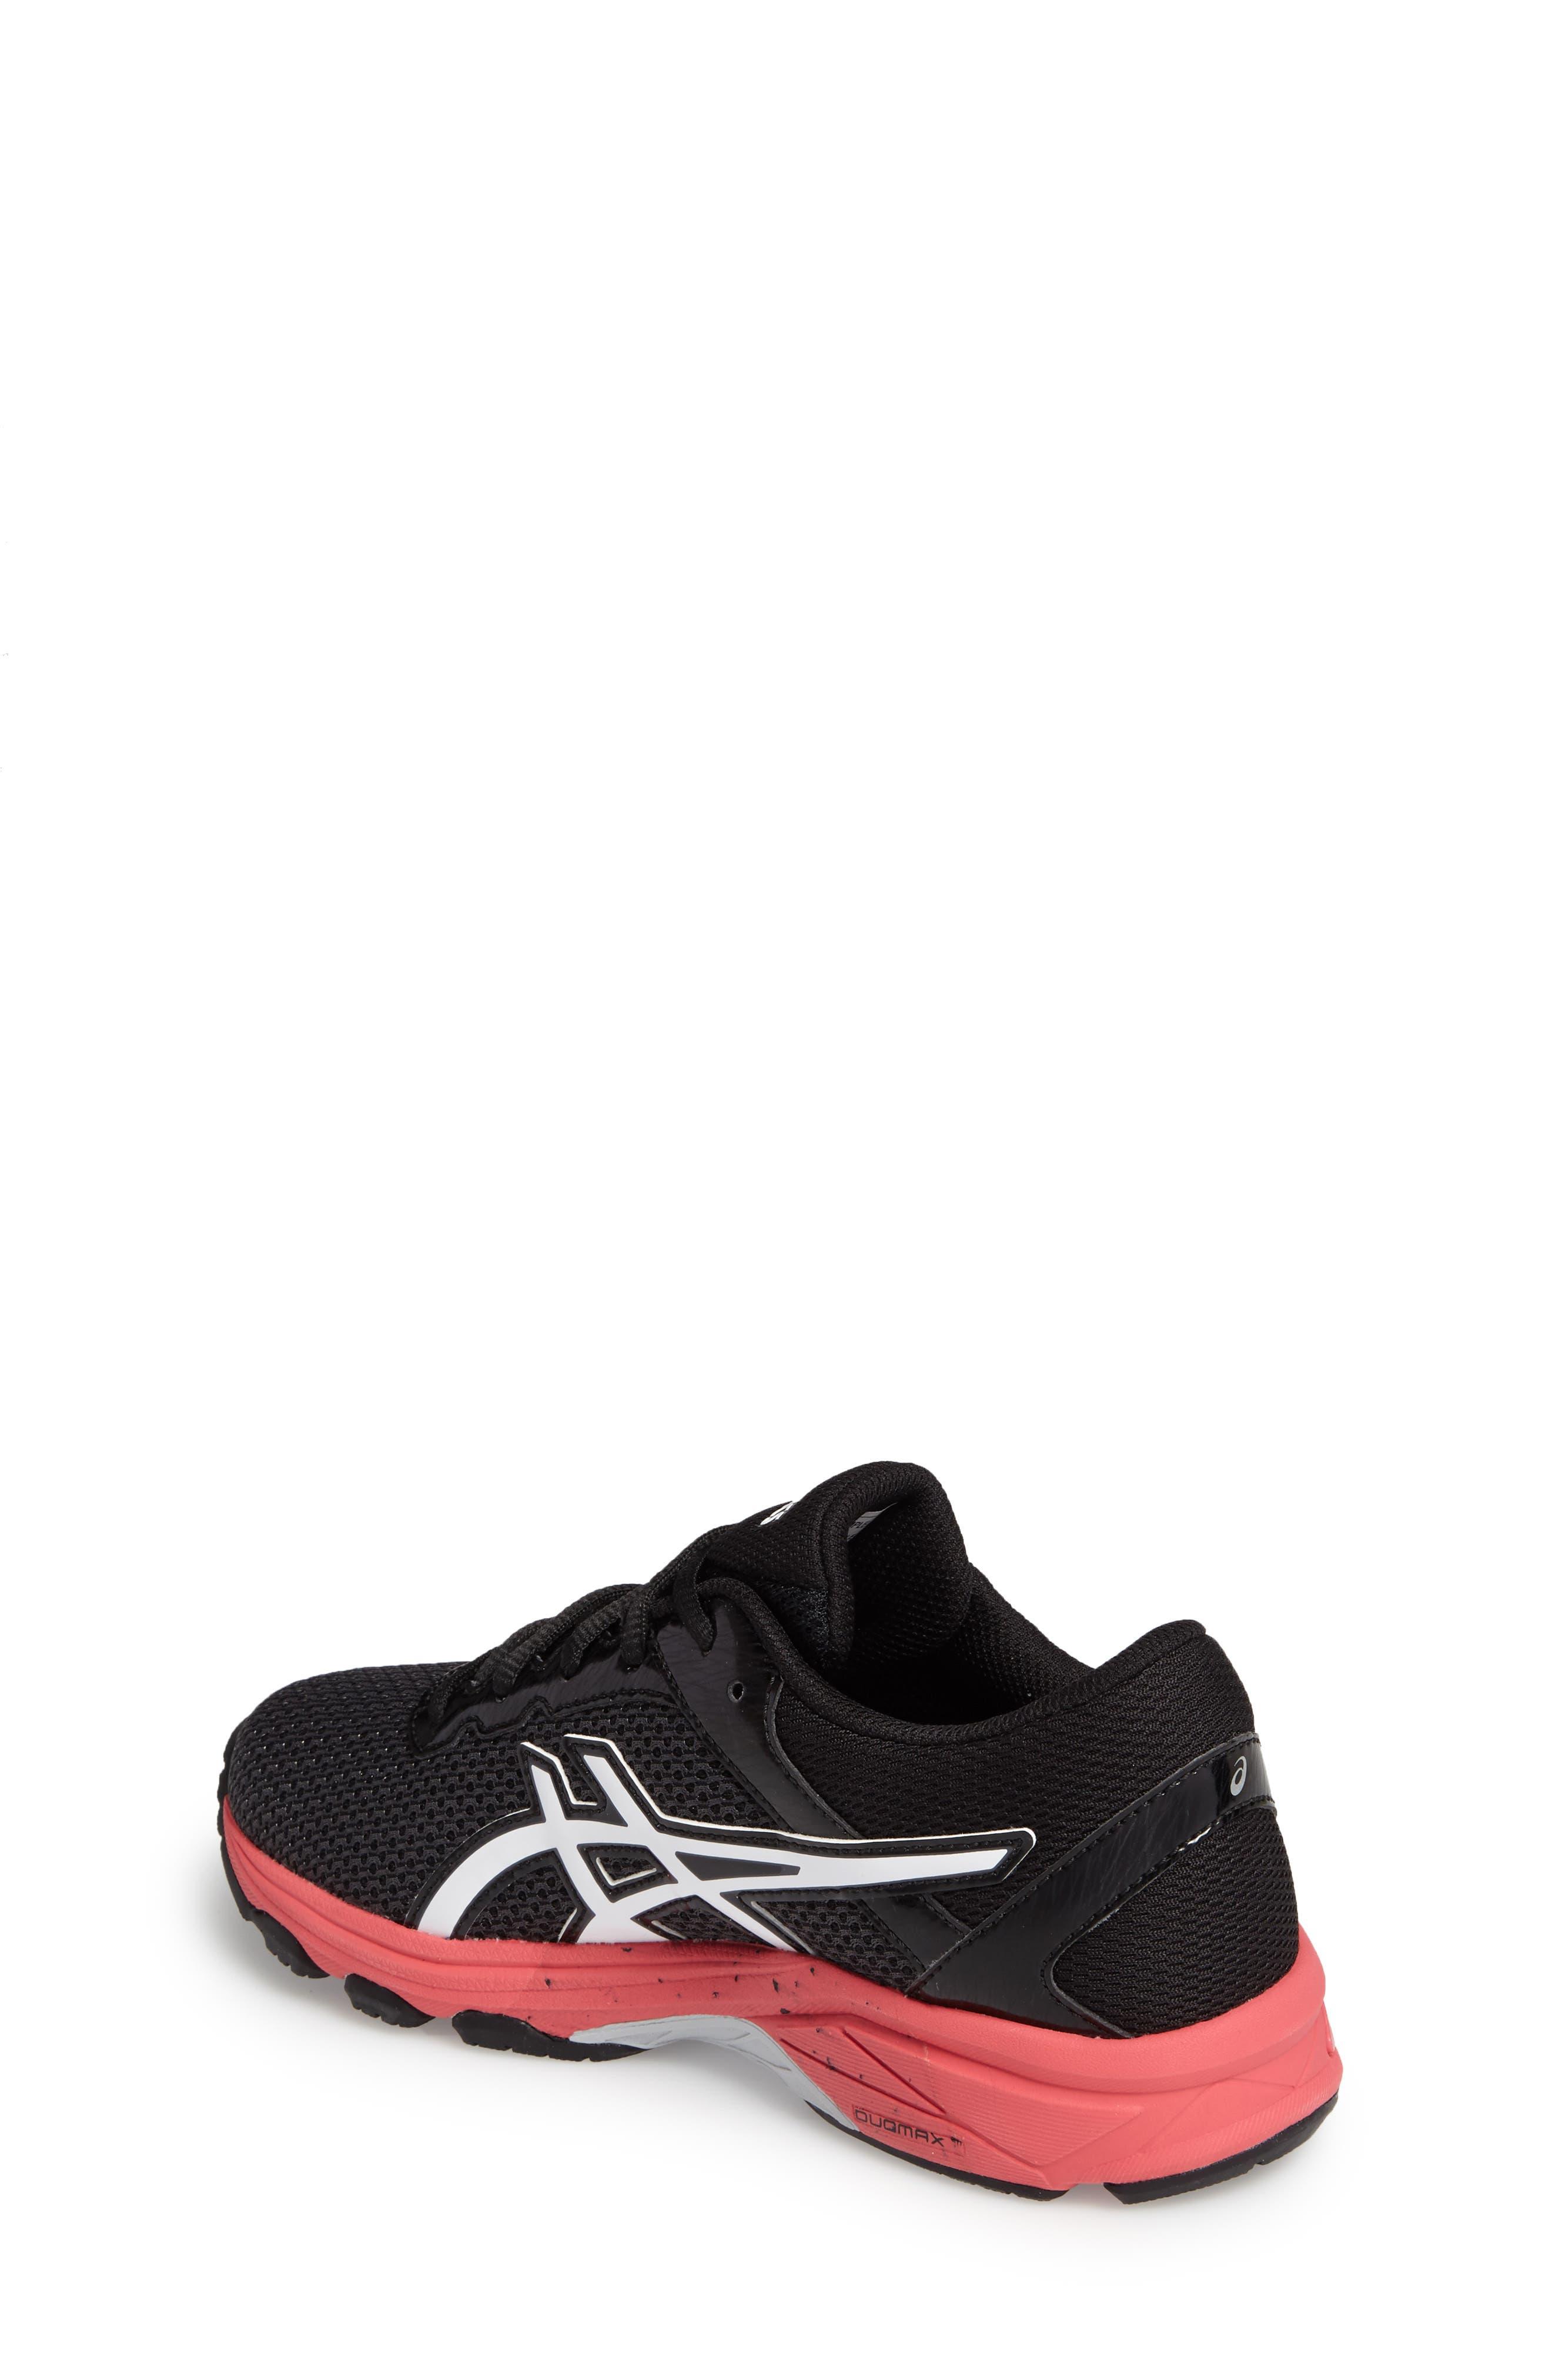 Asics GT-1000<sup>™</sup> 6 GS Sneaker,                             Alternate thumbnail 9, color,